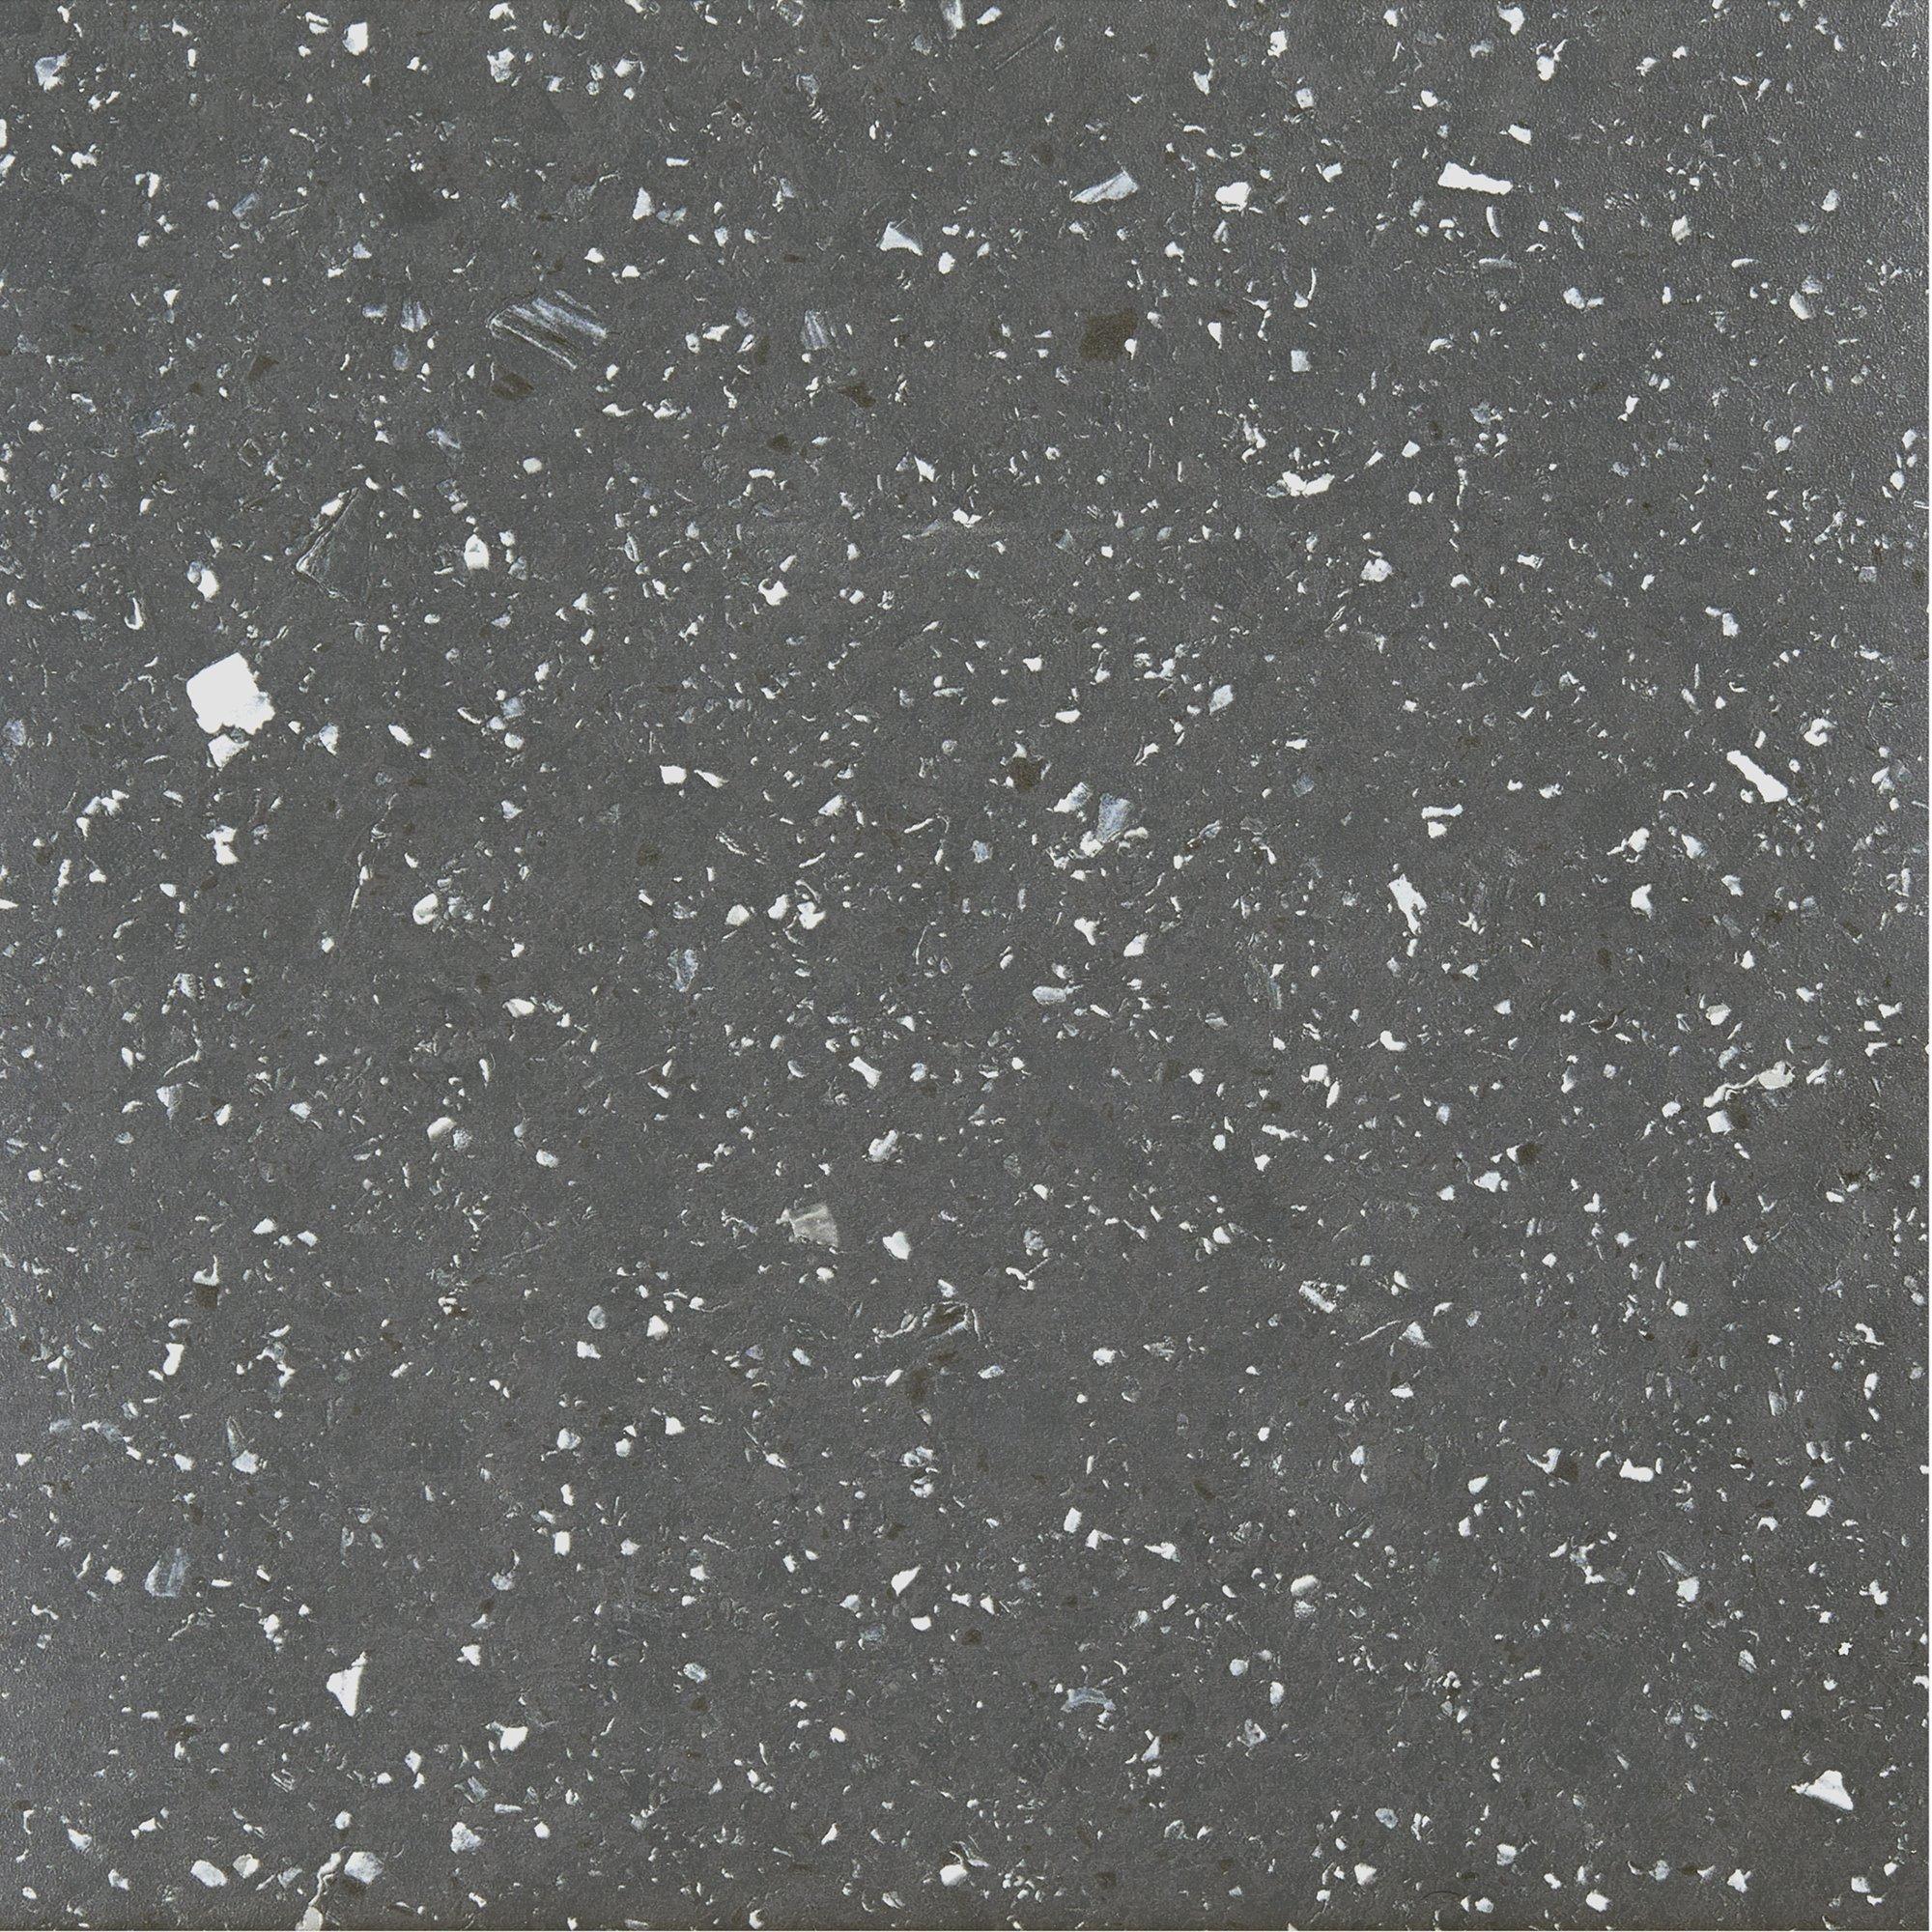 Achim Home Furnishings STBSG70620 Sterling Self Adhesive Vinyl Floor Tile, 12'' x 12'', Black Speckled Granite